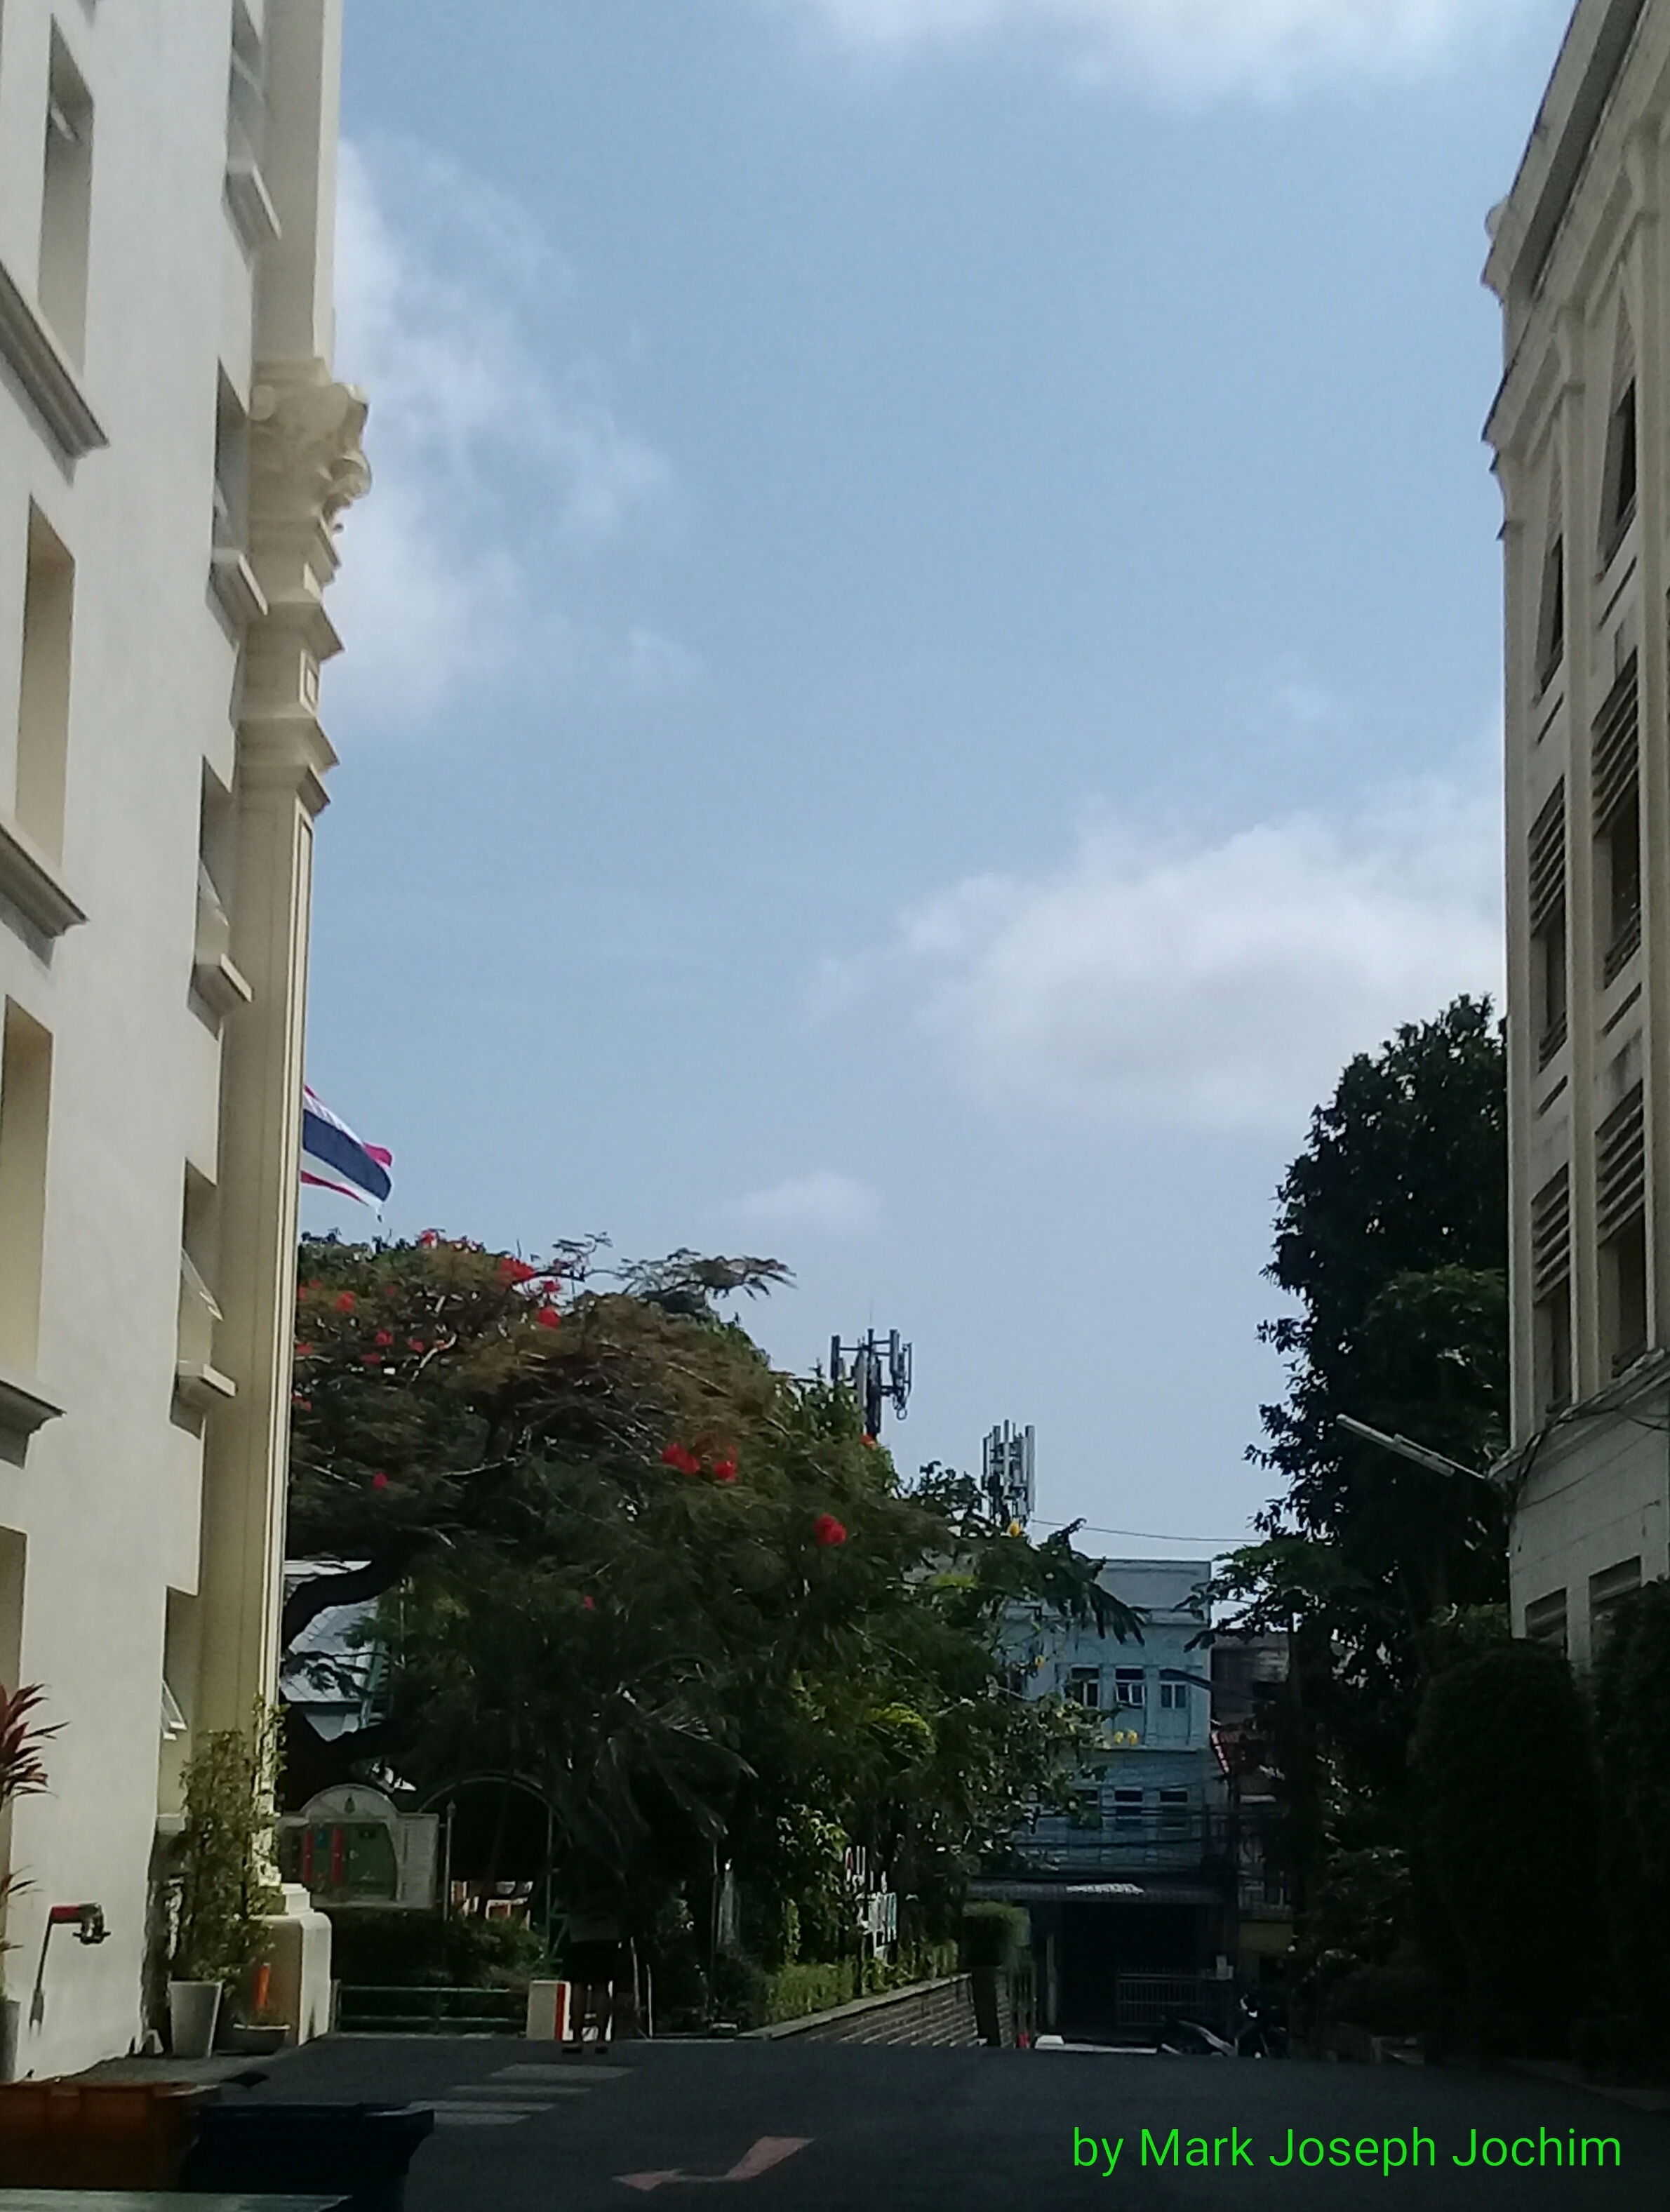 View from Plukpanya Municipal School, looking eastward to the main gate.